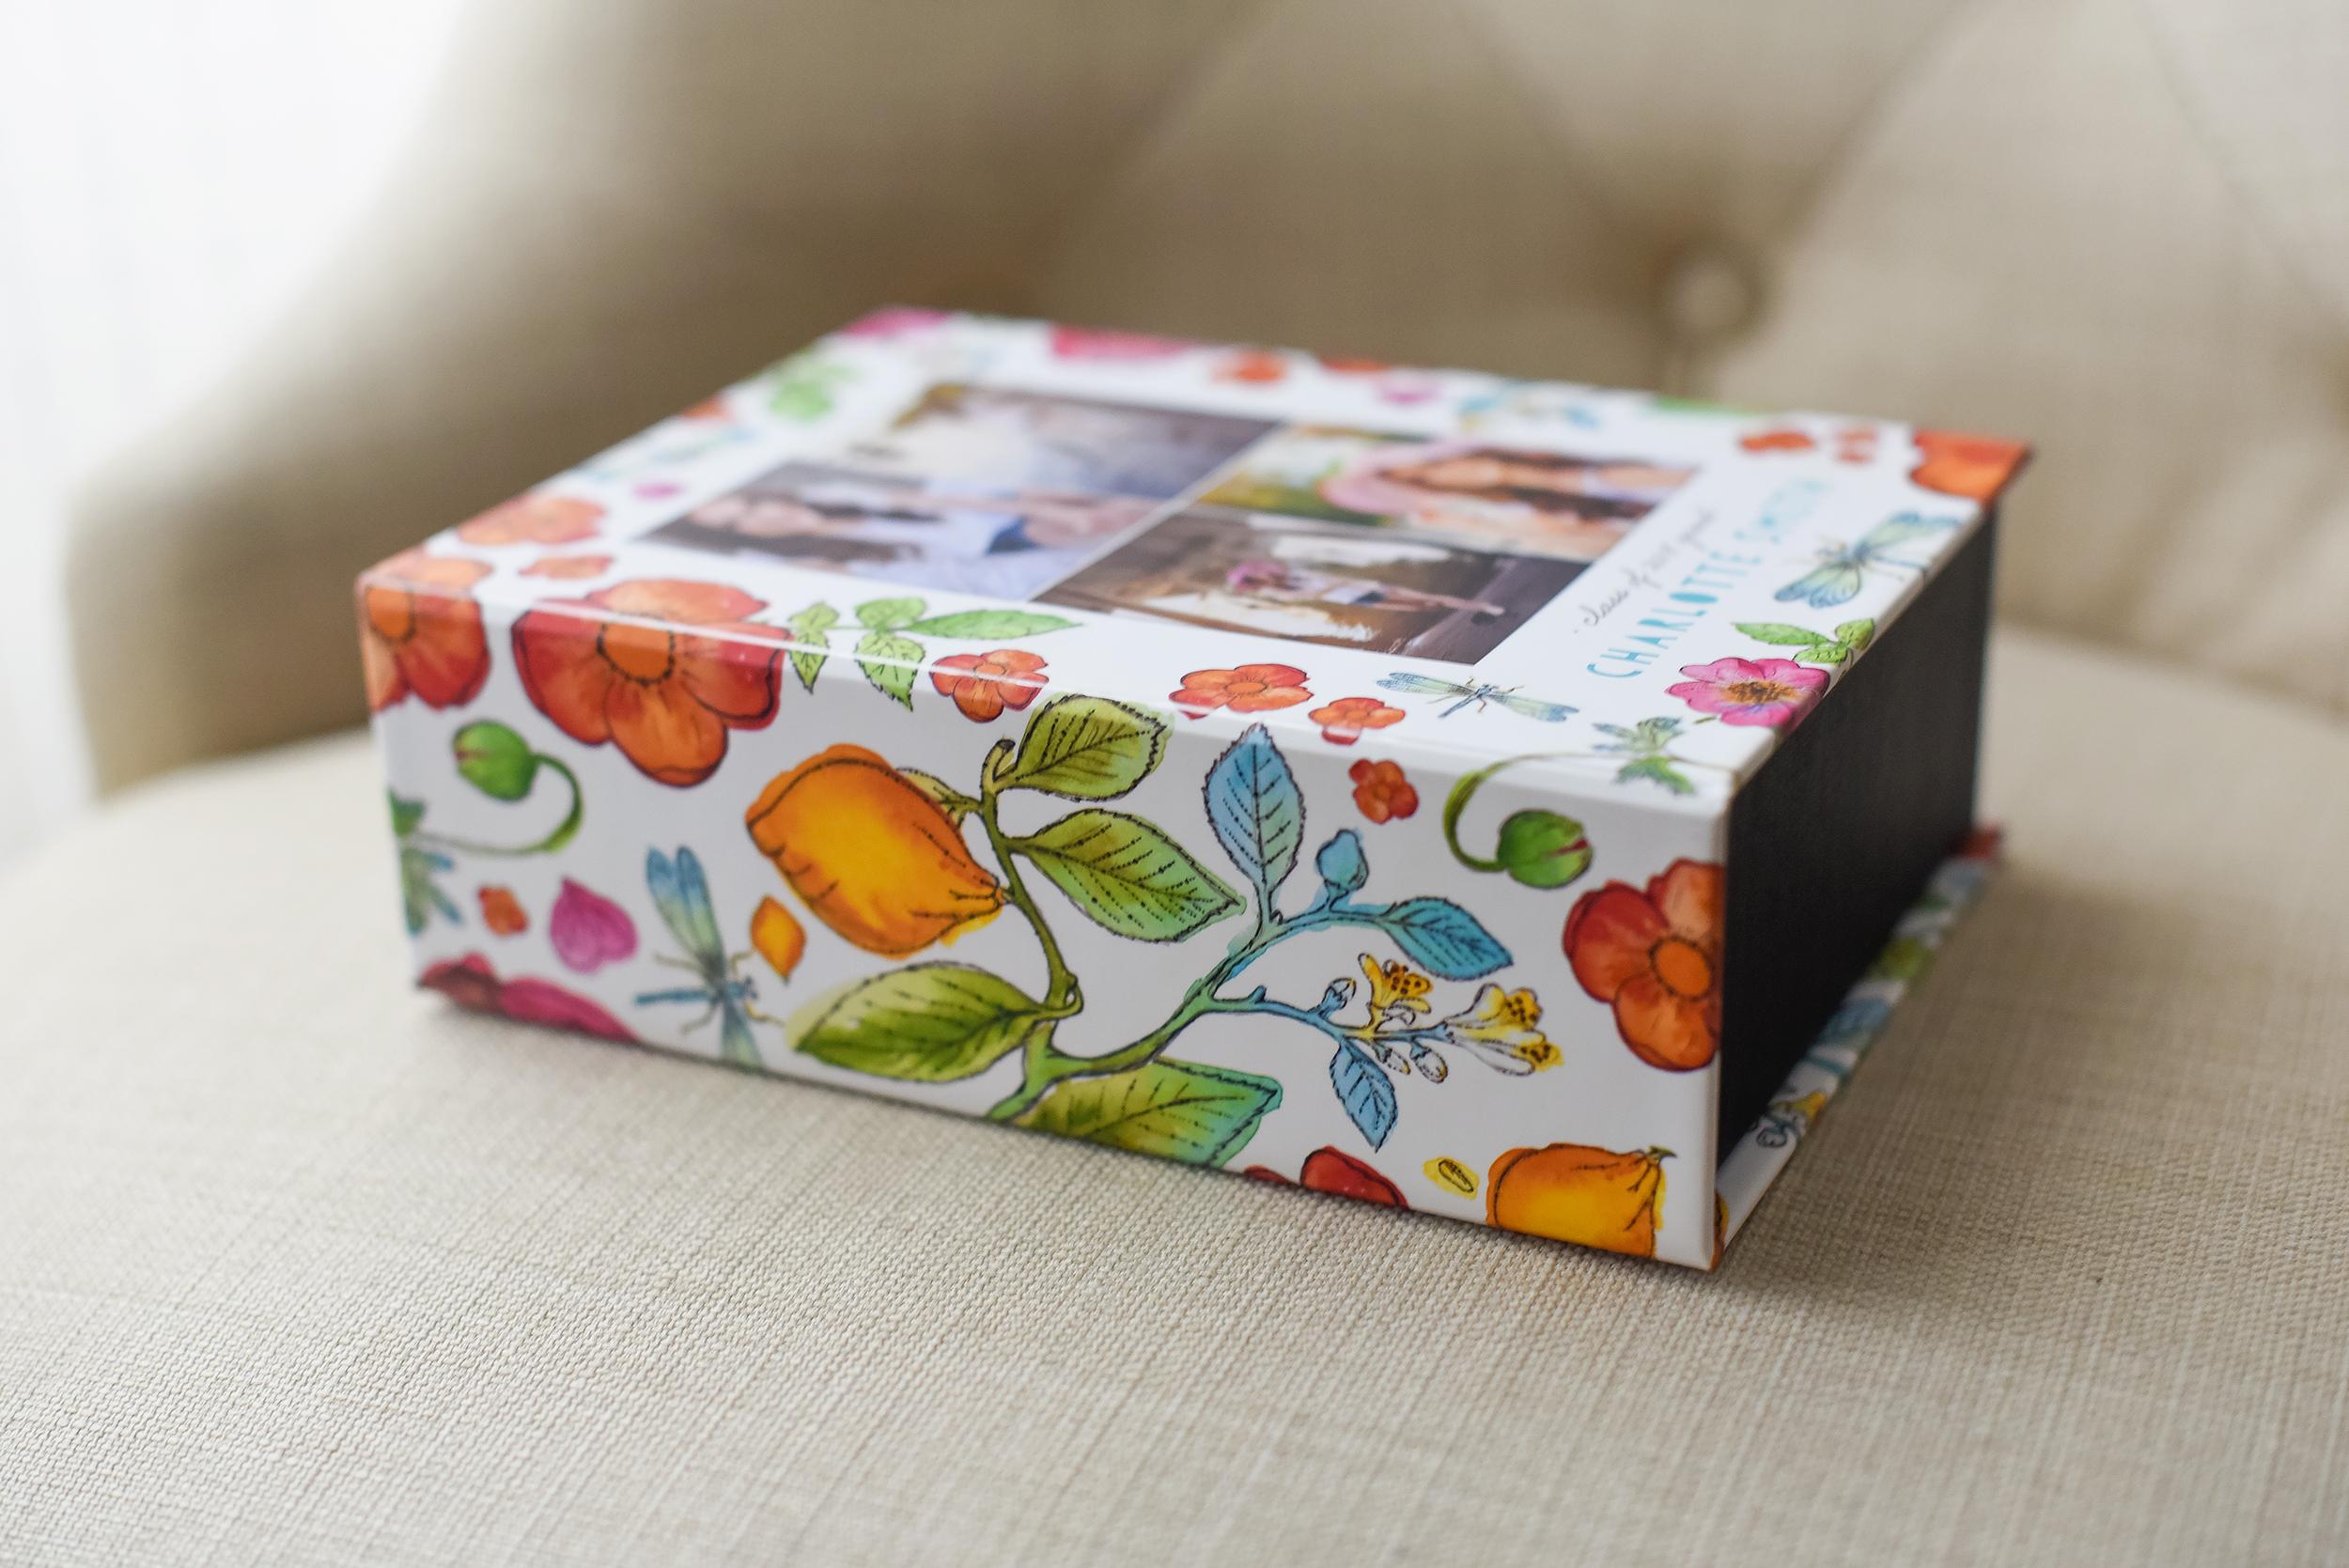 keepsake-box-treasure-storybook-spine.jpg